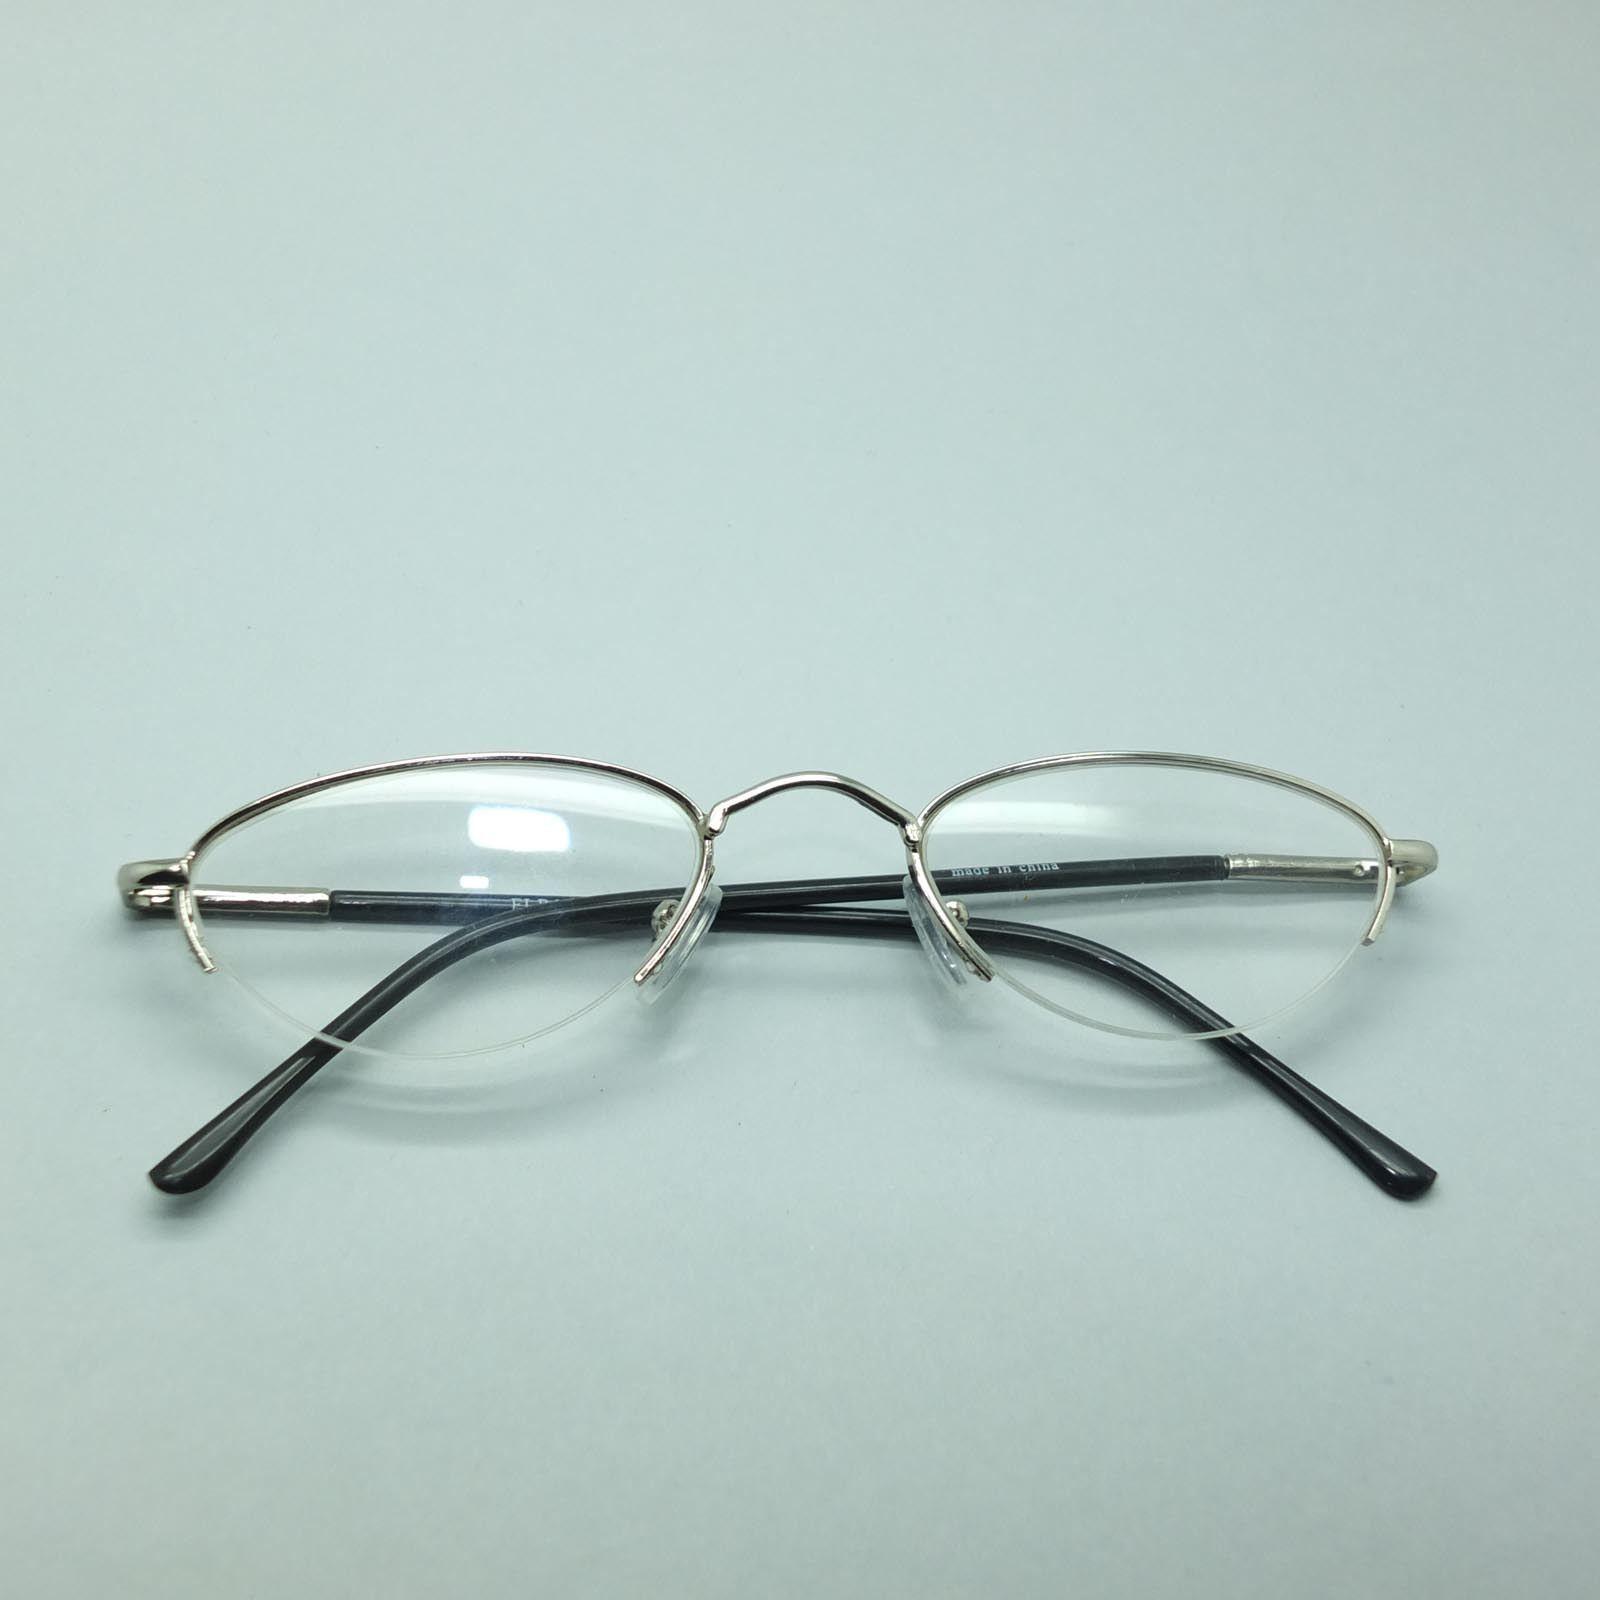 Best Metal Frame Glasses : Delicate Oval Silver Metal Top Frame Reading Glasses ...